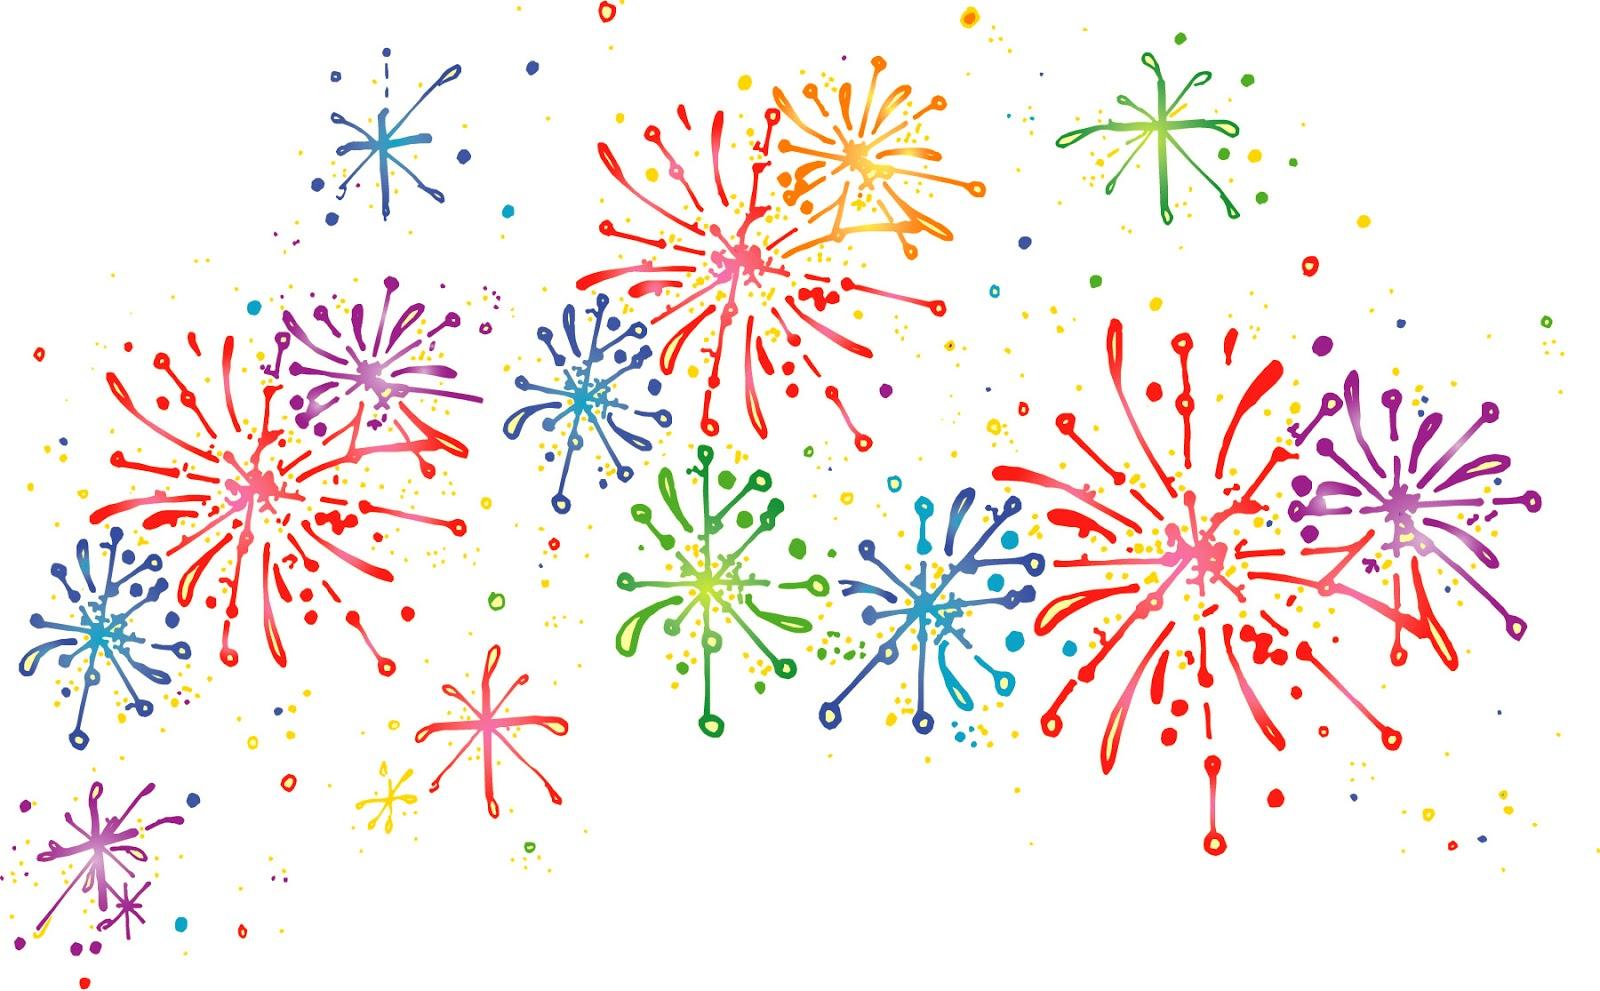 Clip Art. Clip Art Fireworks. Stonetire Free Clip Art Images.